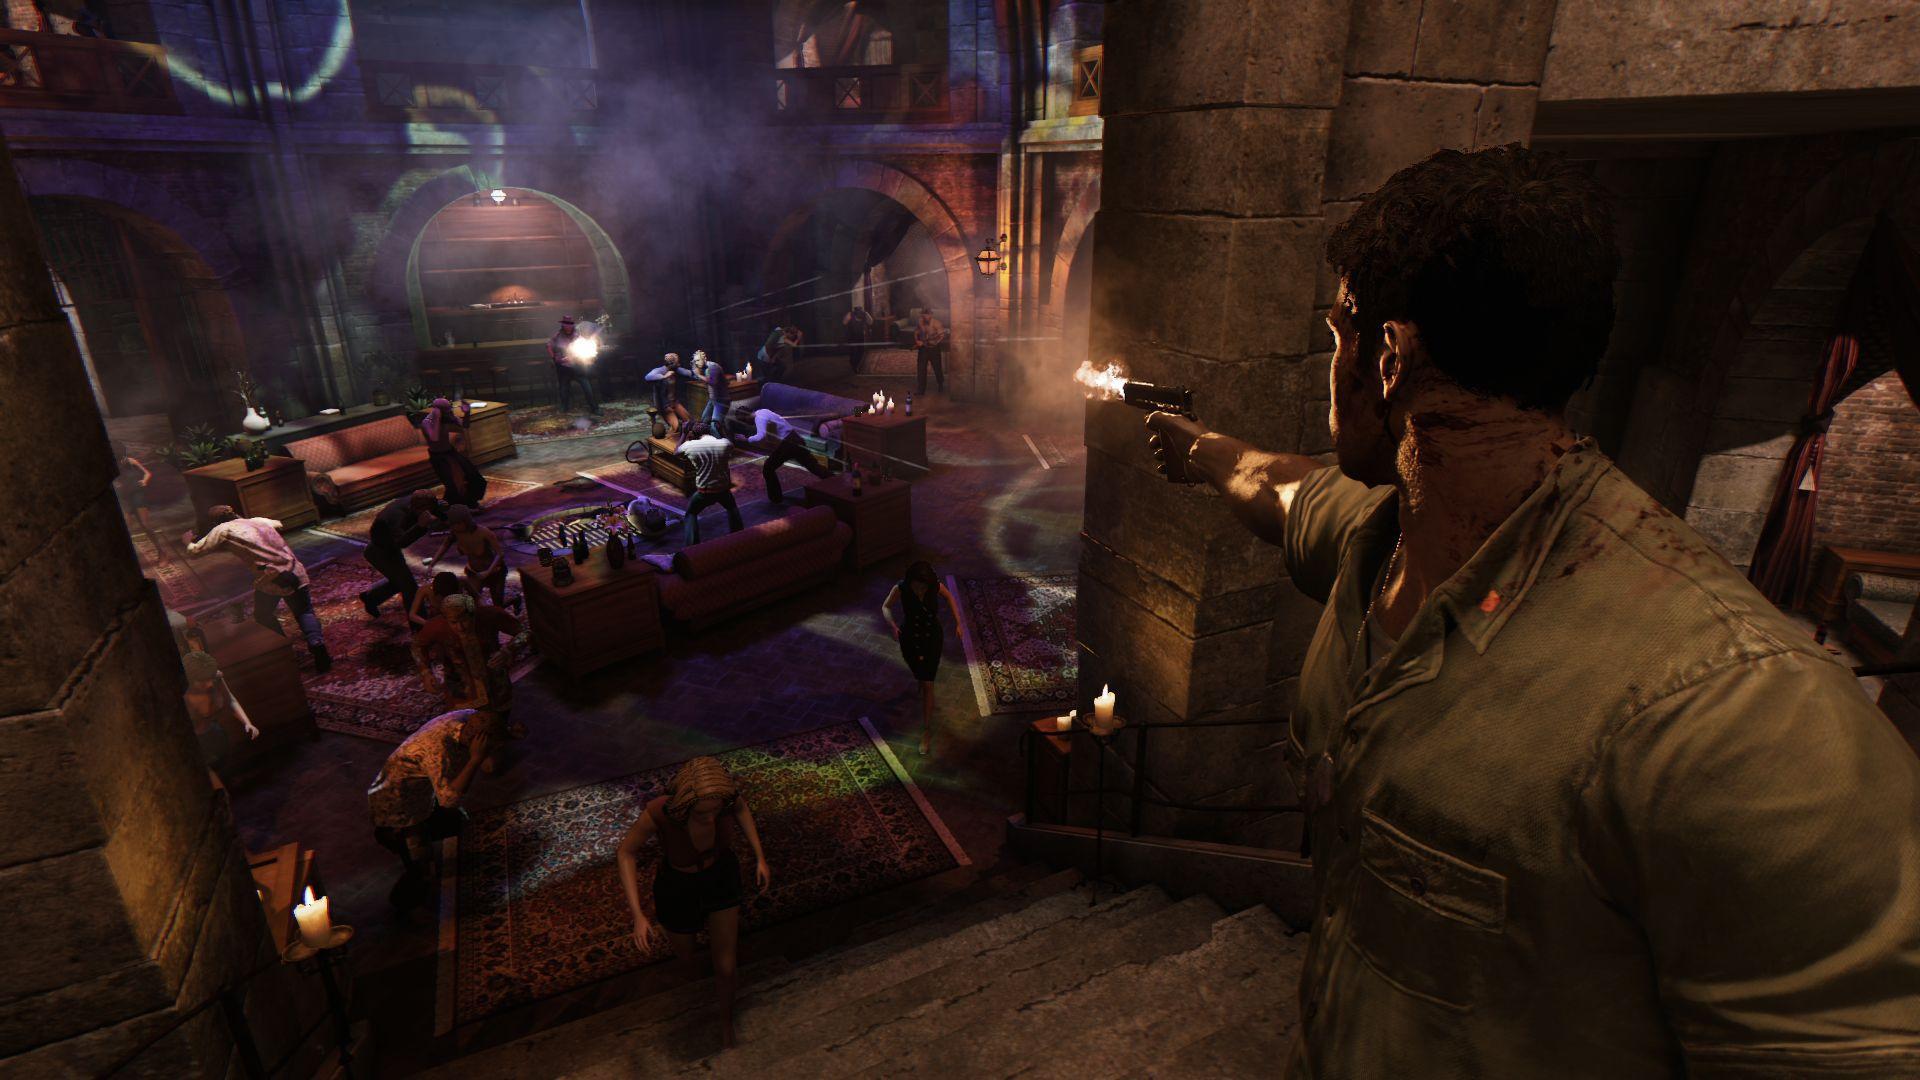 Mafia Iii Notre Test Sur Playstation 4 Gamekult